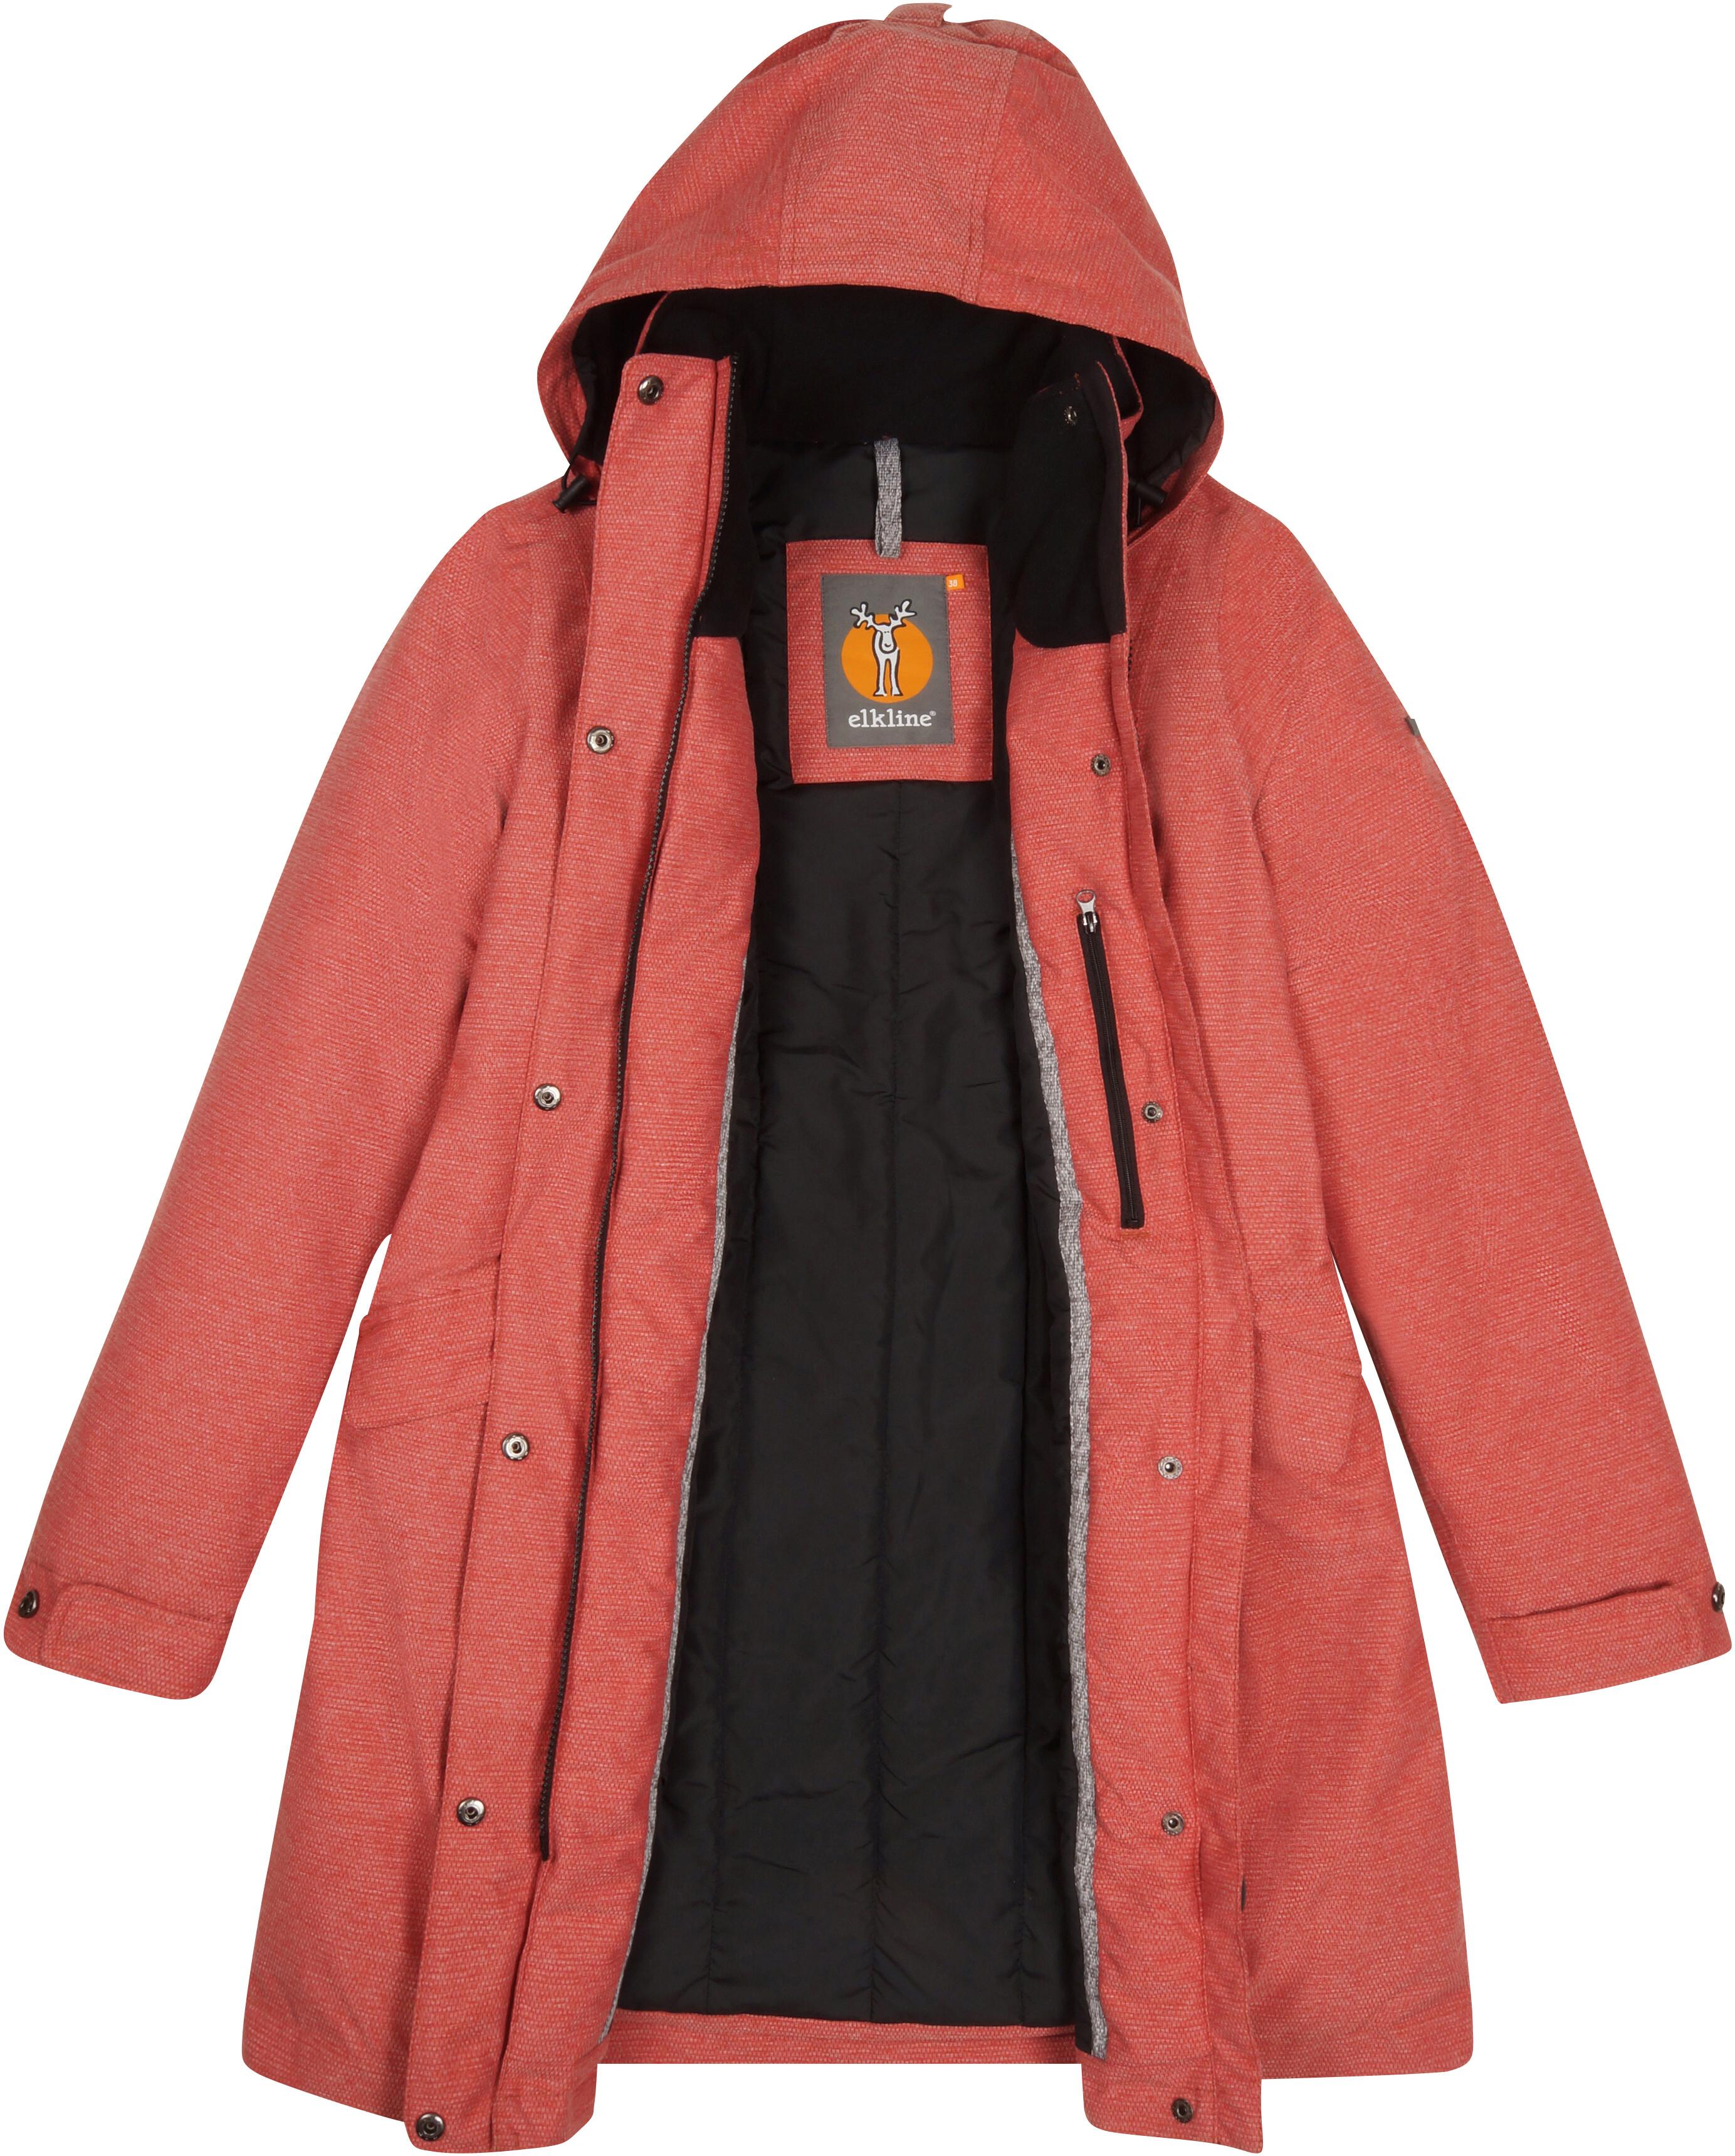 Elkline Warmumsherz Outdoorjacke Damen red   campz.de ff8708168c